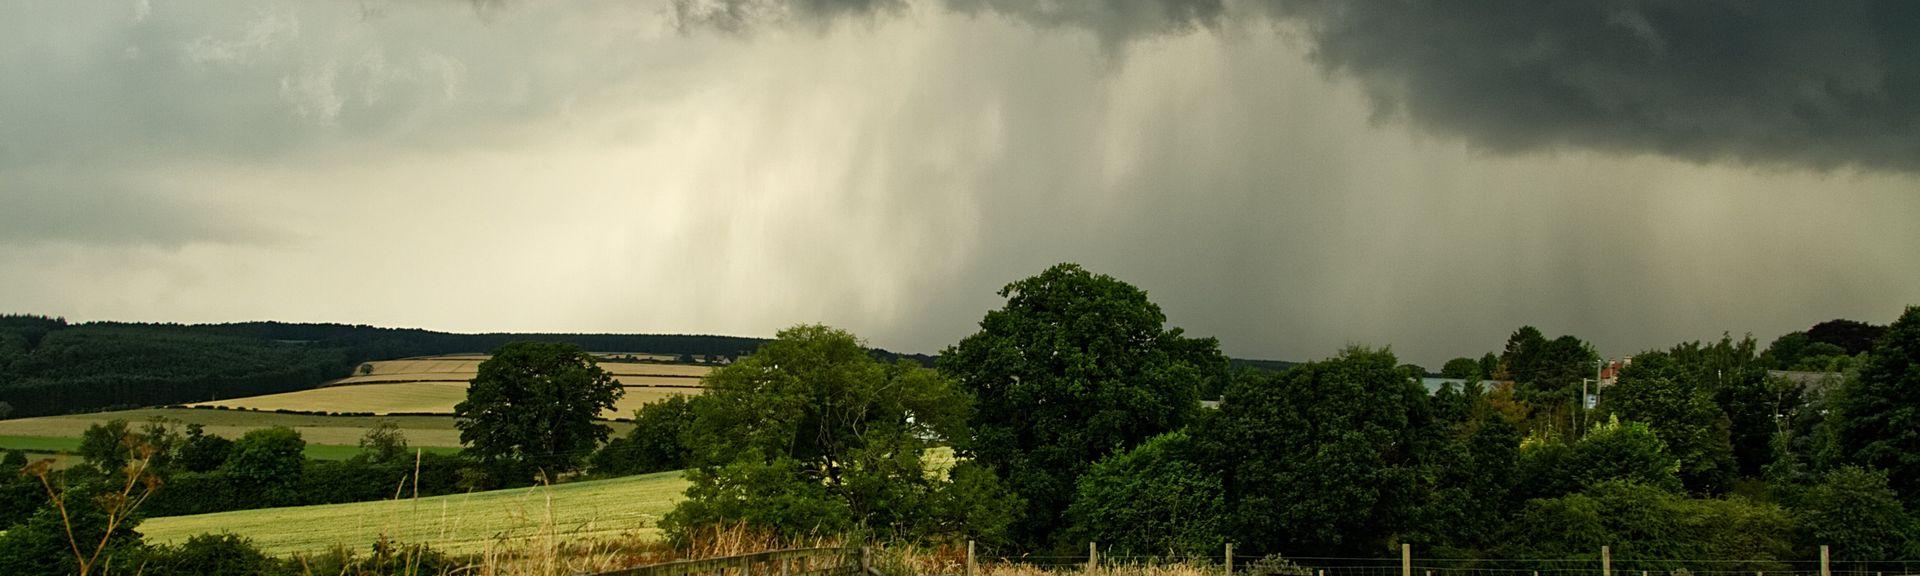 Nawton, North Yorkshire, UK